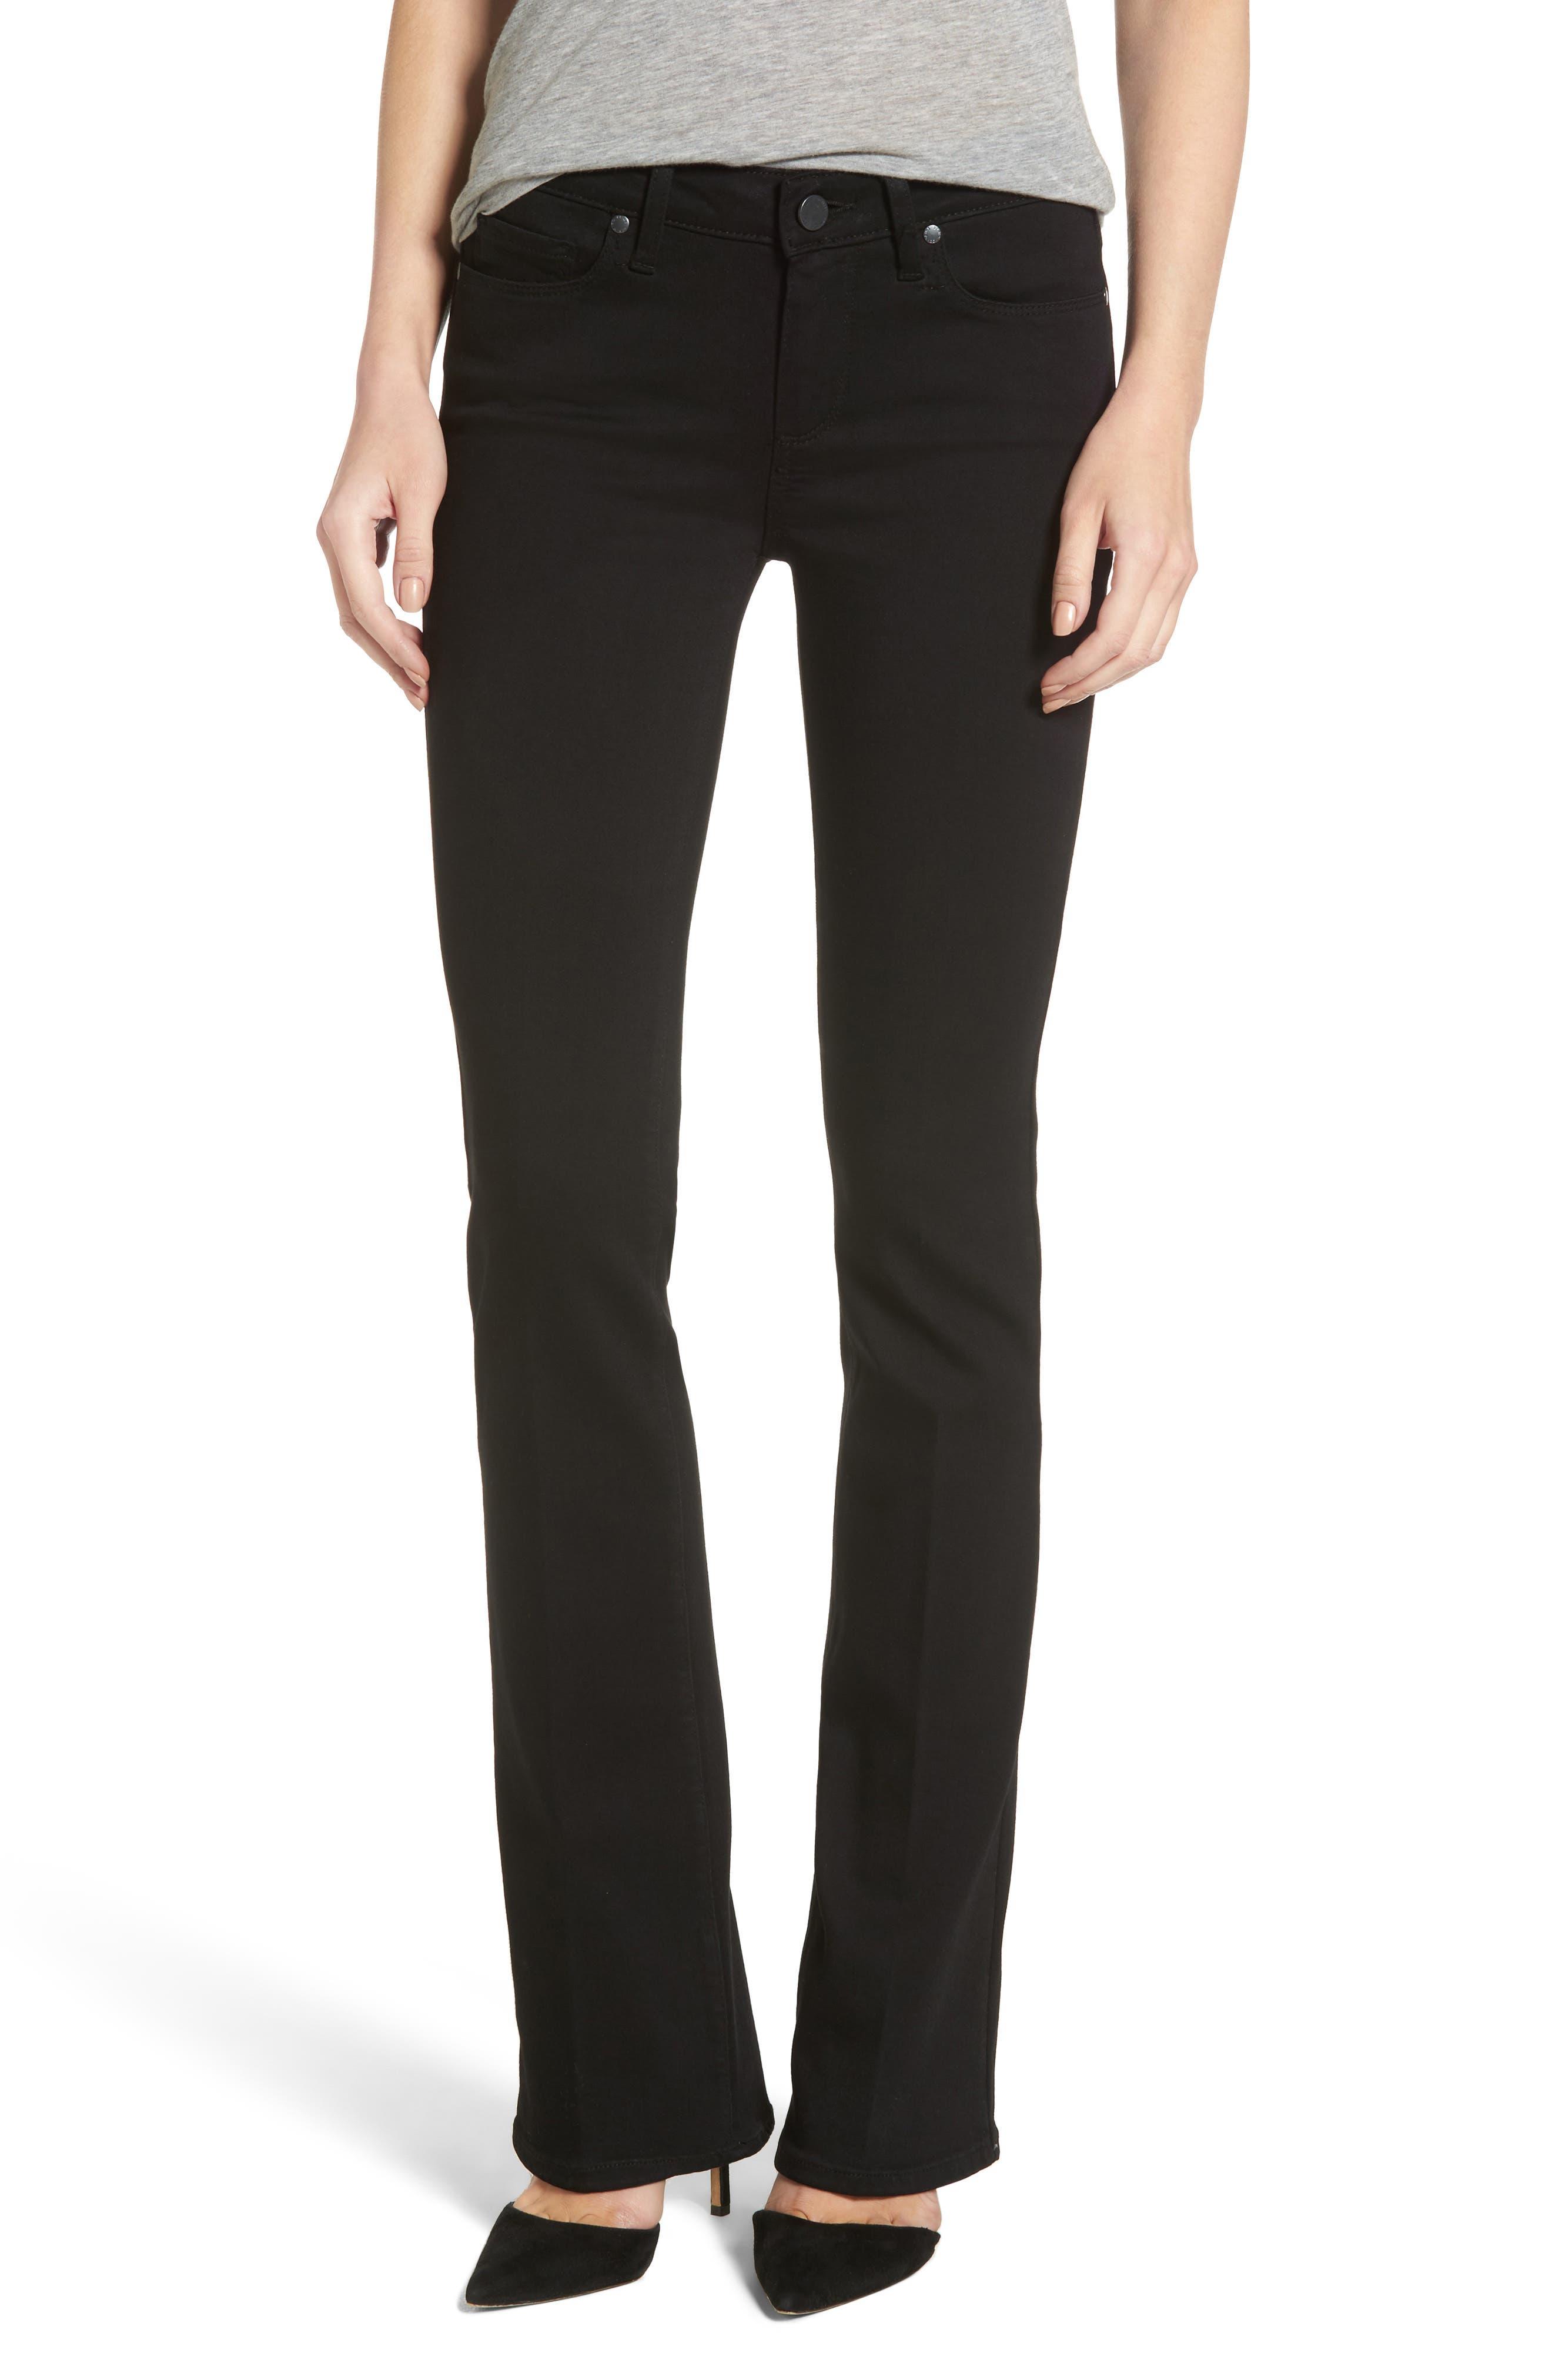 Transcend - Manhattan Bootcut Jeans,                         Main,                         color, Black Shadow